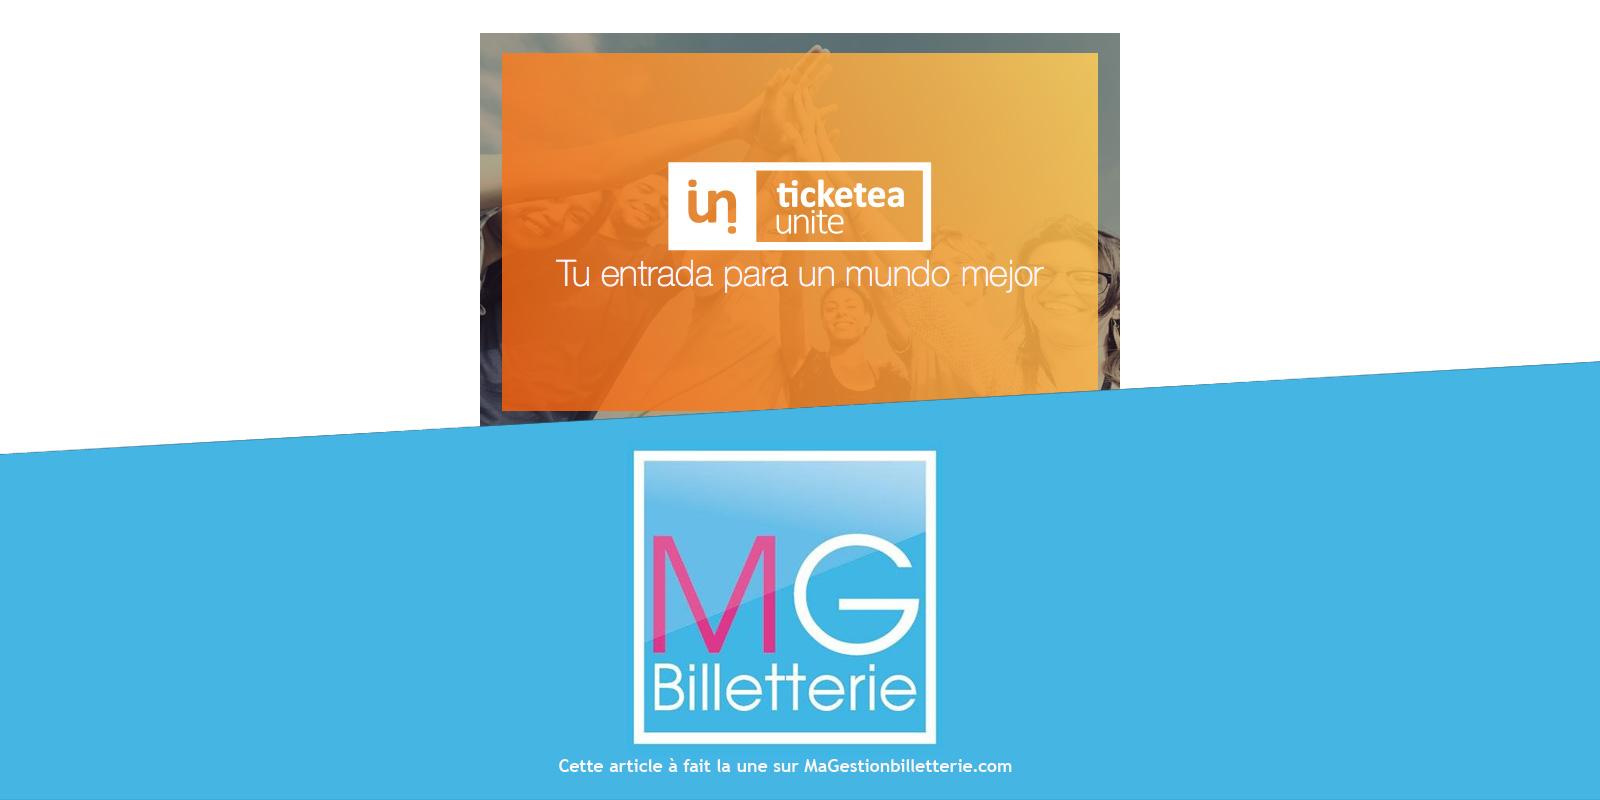 unite-ticketea-une3